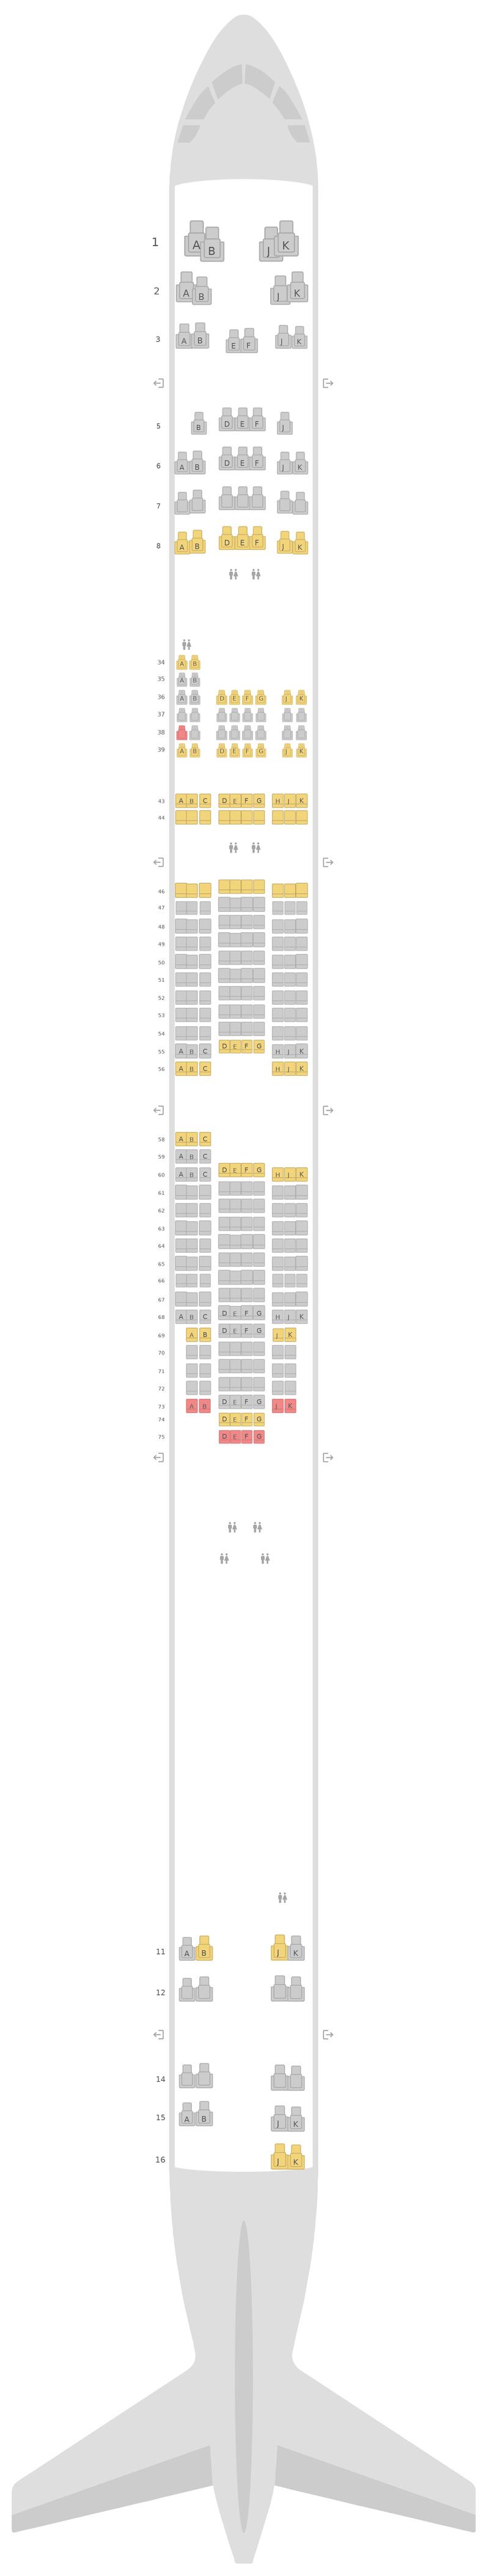 Схема салона Боинг 747-400 (744) Qantas